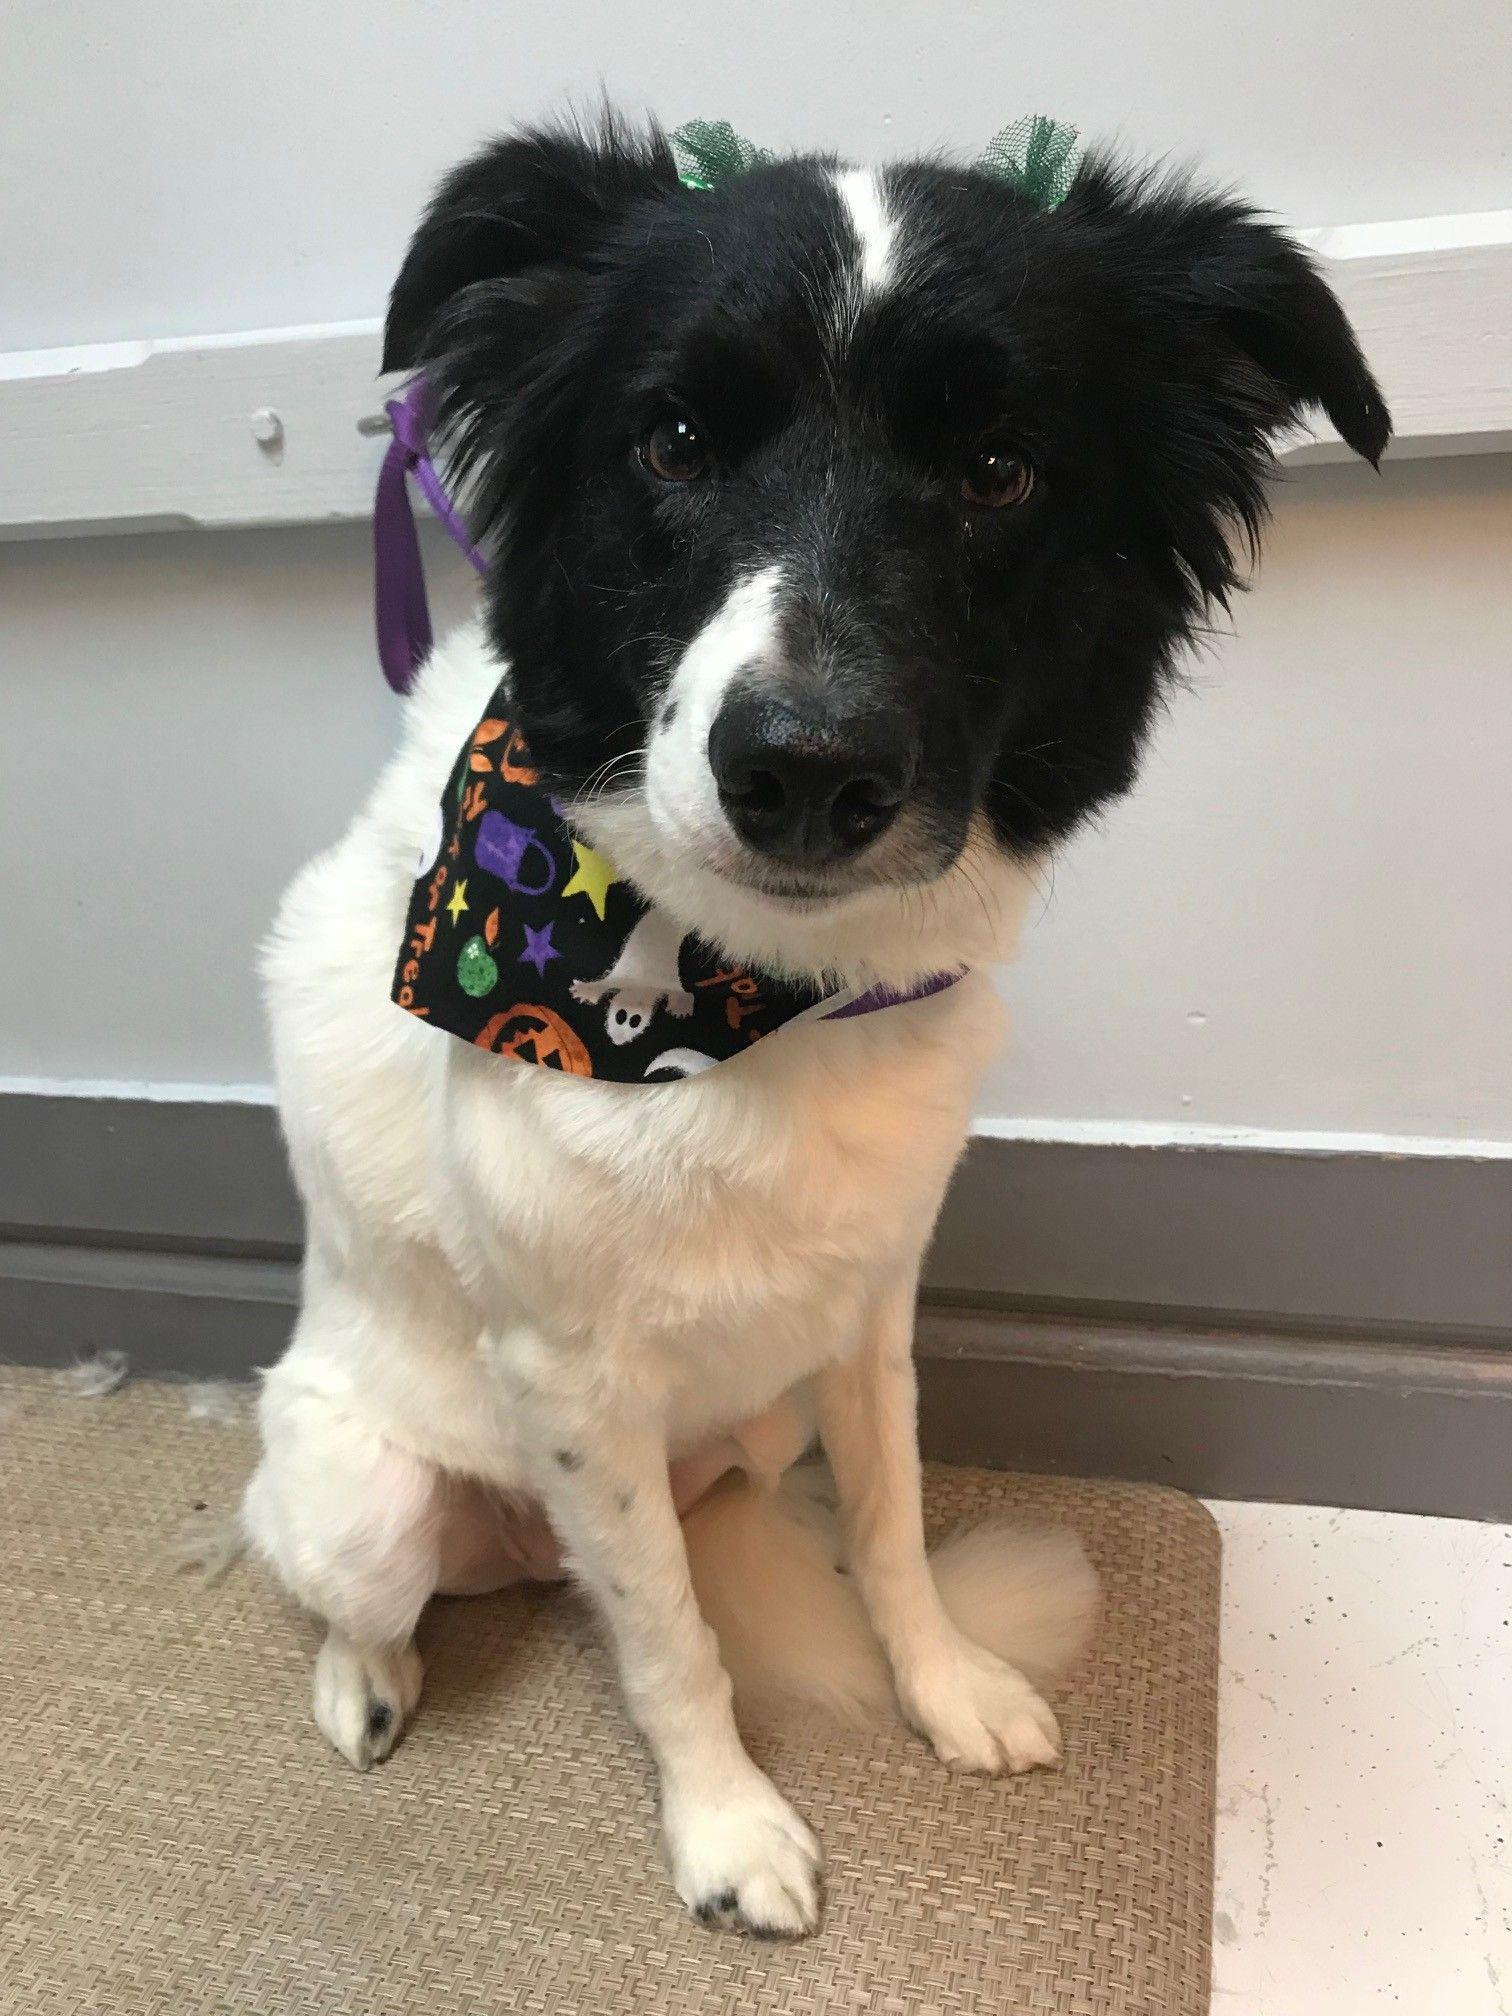 Grooming Pet clinic, Pet grooming, Dog groomers